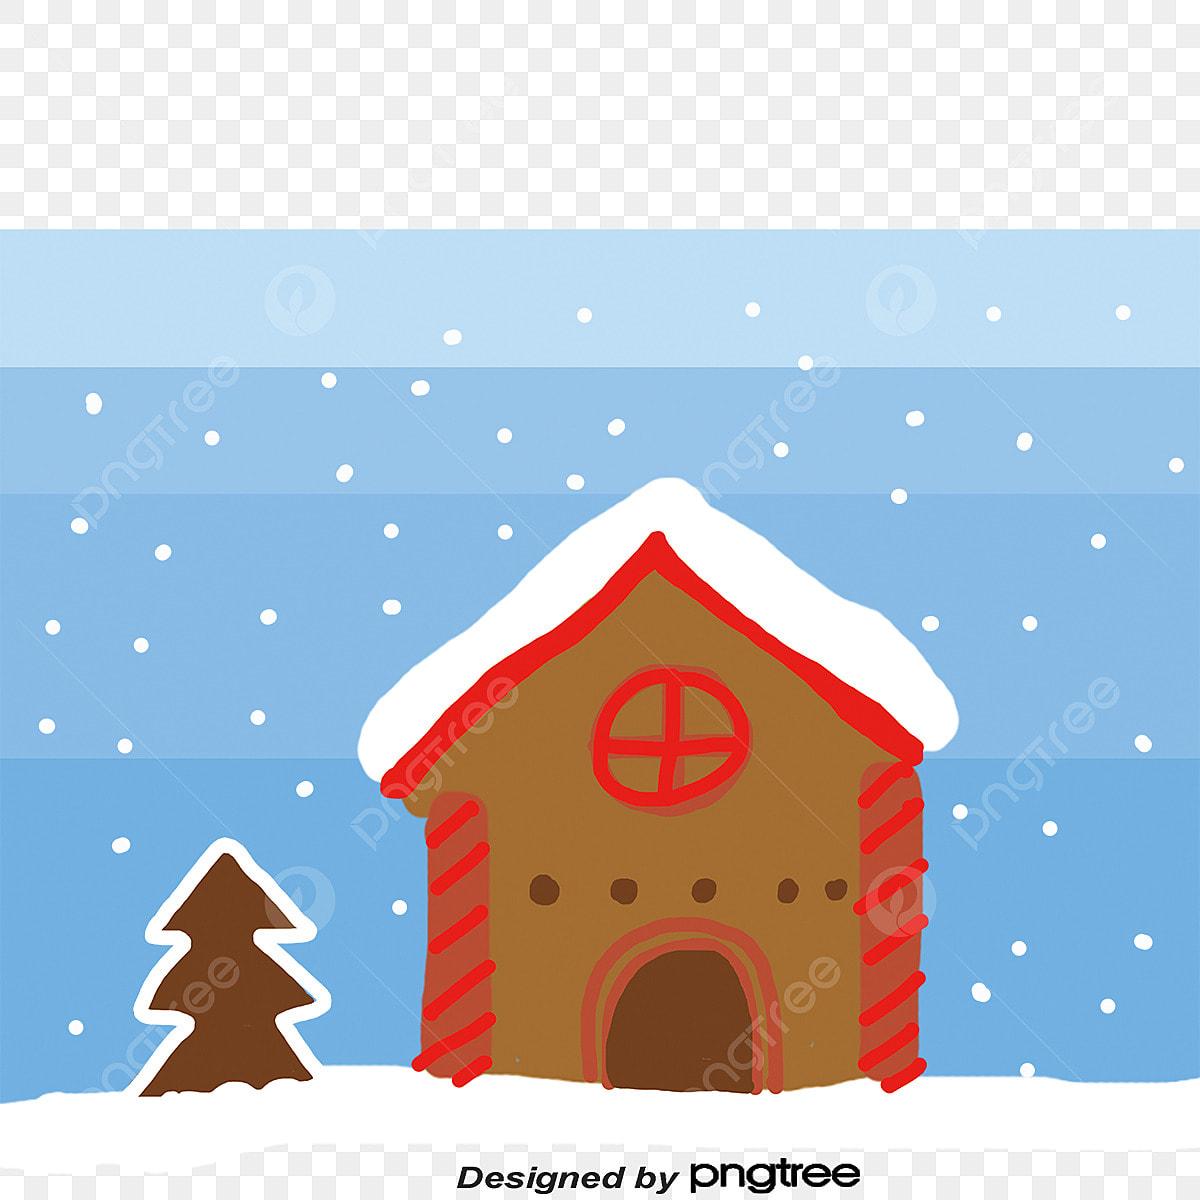 Christmas Gingerbread House Cartoon.Cartoon Christmas Gingerbread House Vector Material